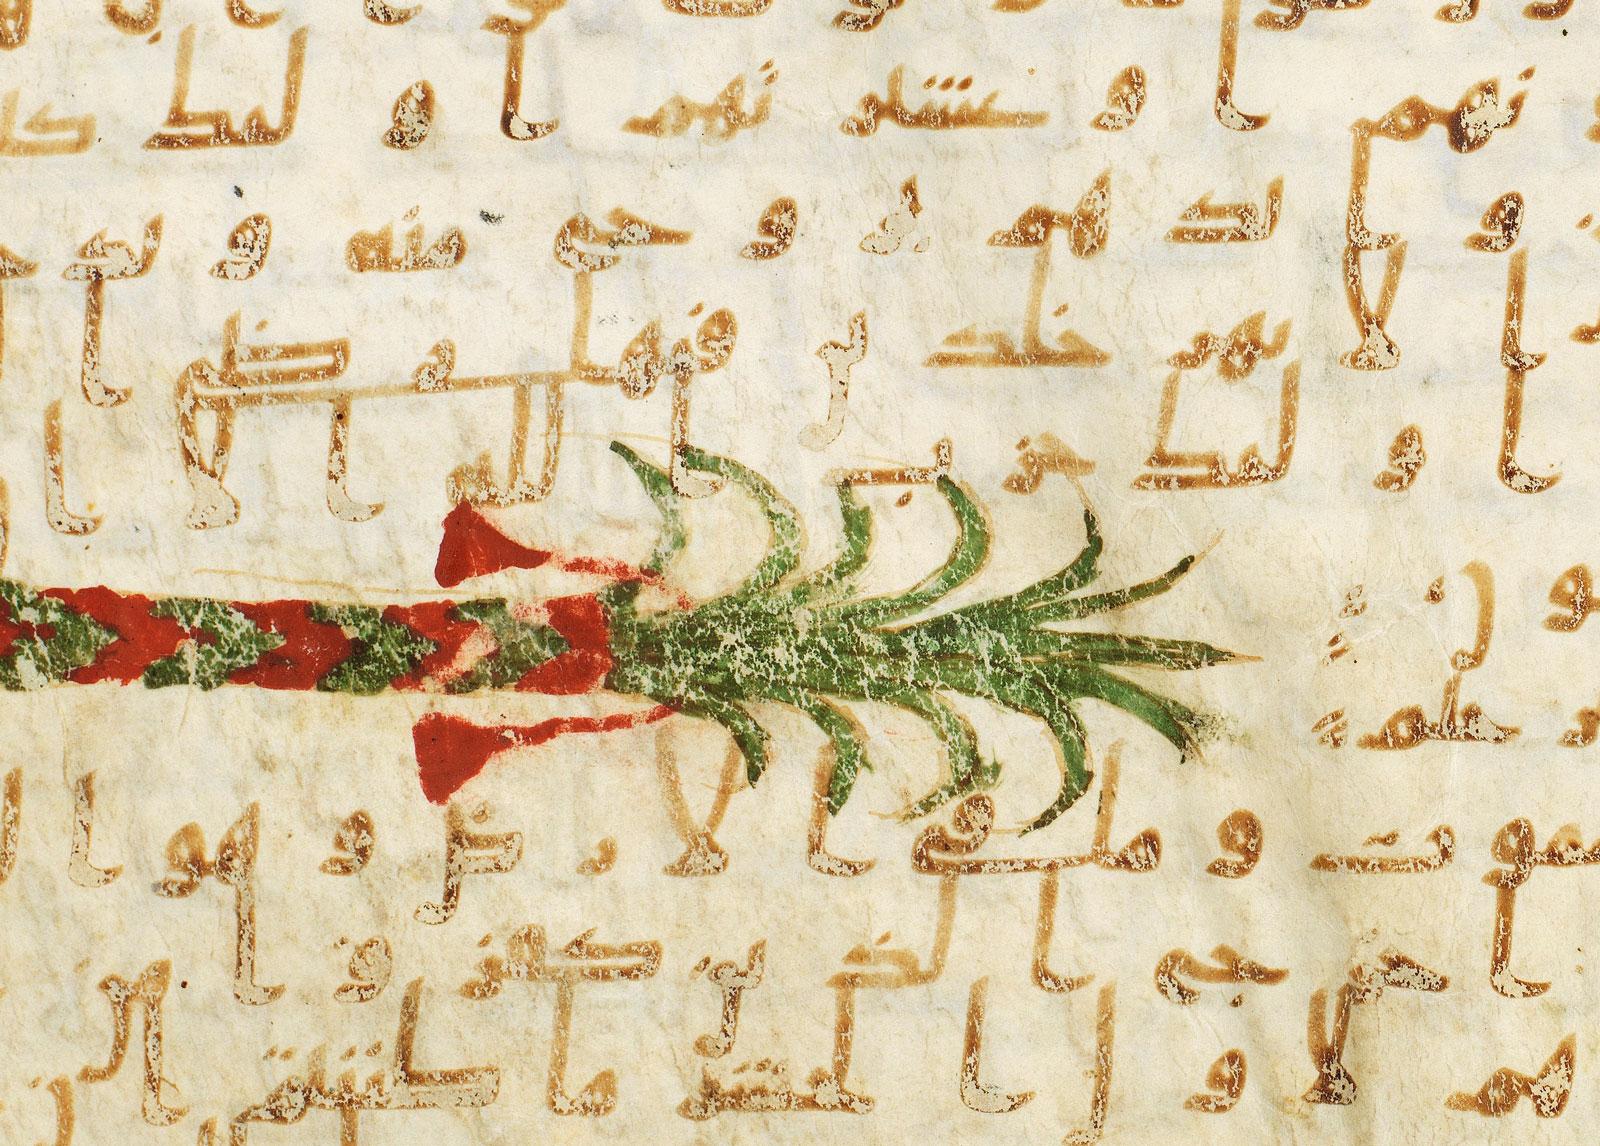 Detail from a Koran, Near East, Umayyad period, before 725